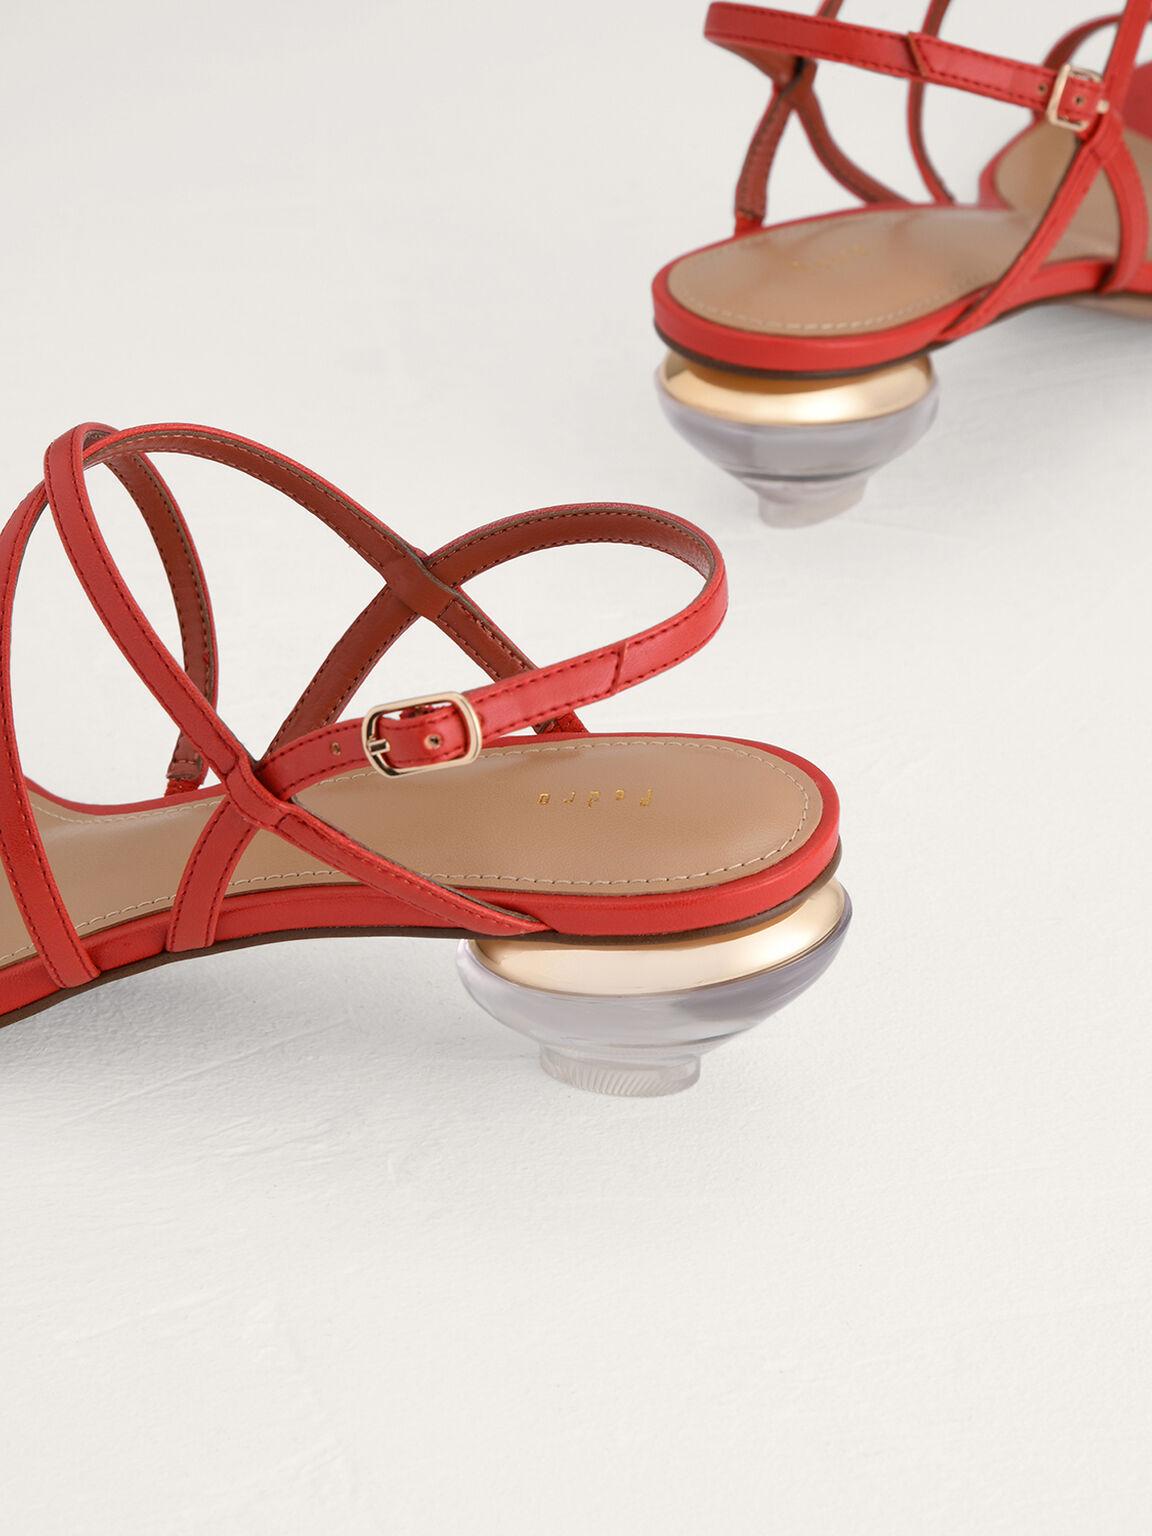 Strappy Heeled Slingback Sandals, Red, hi-res